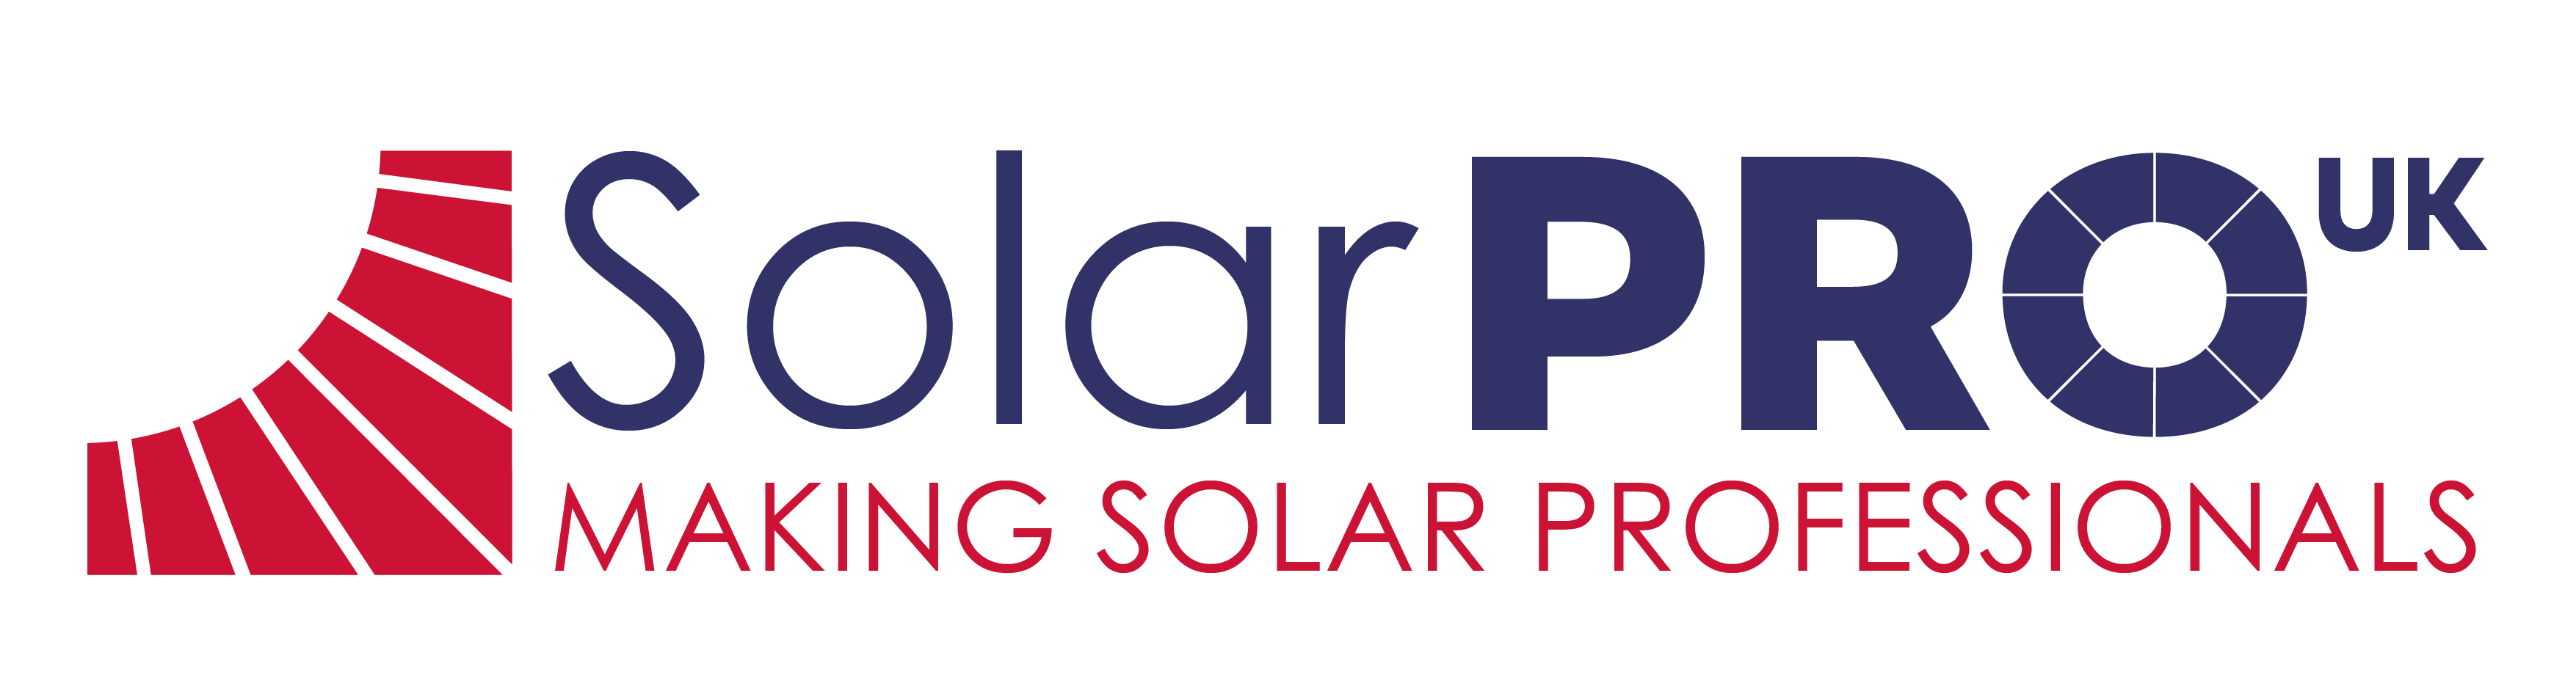 Solar Pro UK. Making Solar professionals.